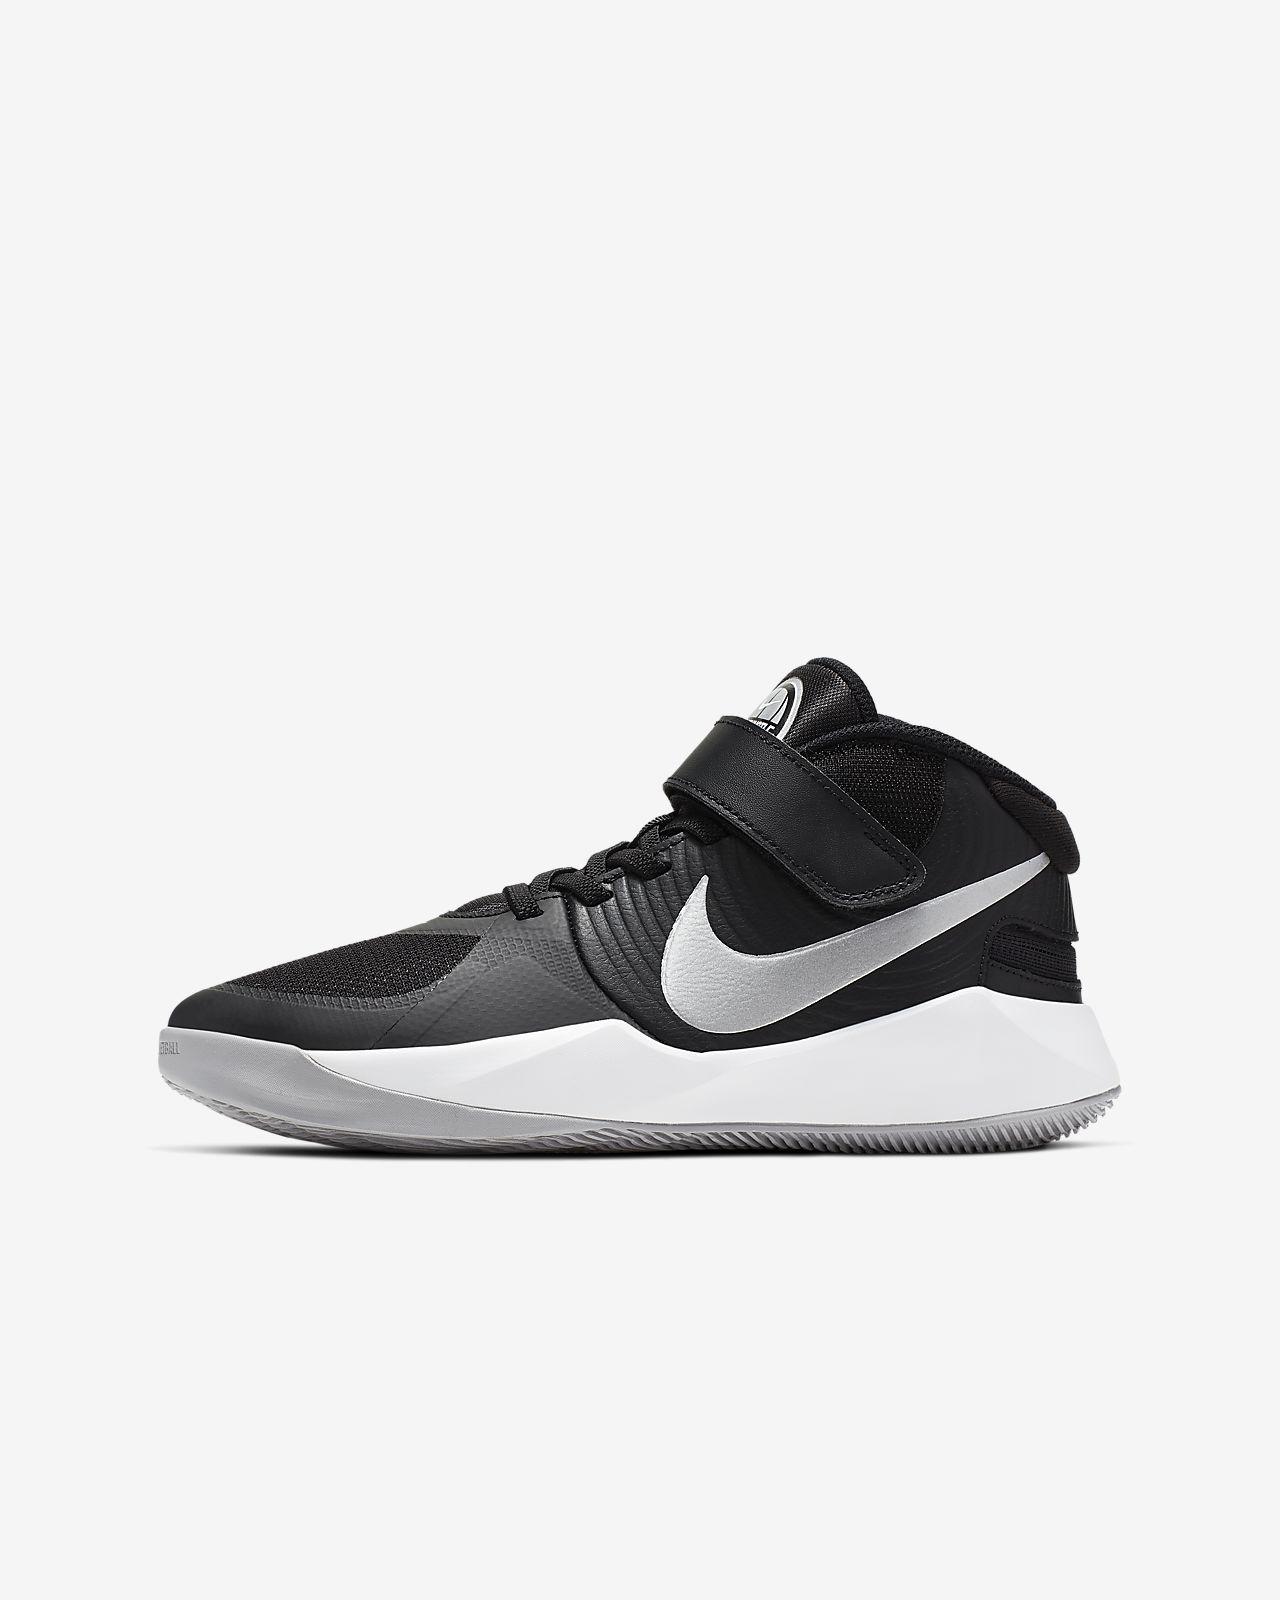 Nike Team Hustle D 9 FlyEase Basketbalschoen voor kids